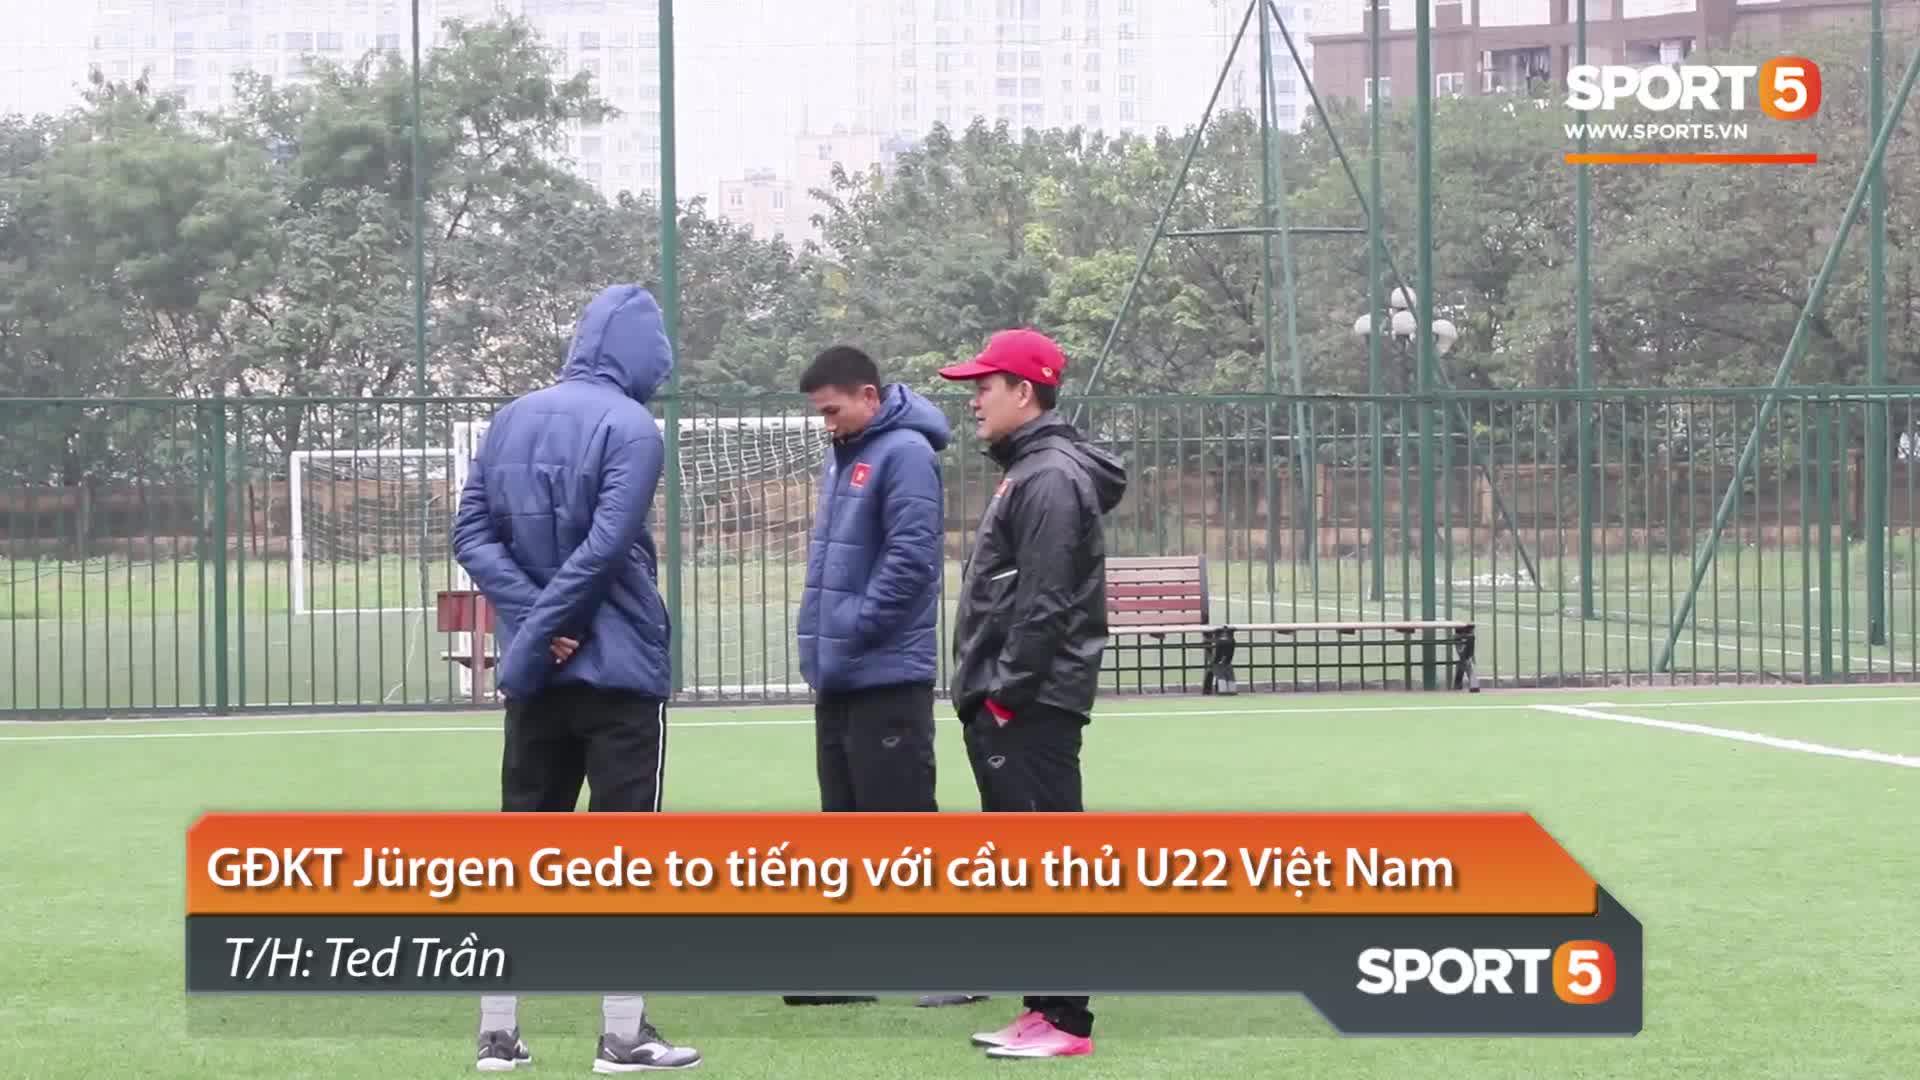 GĐKT Juergen Gede to tiếng với cầu thủ U22 Việt Nam. Video: Ted Trần